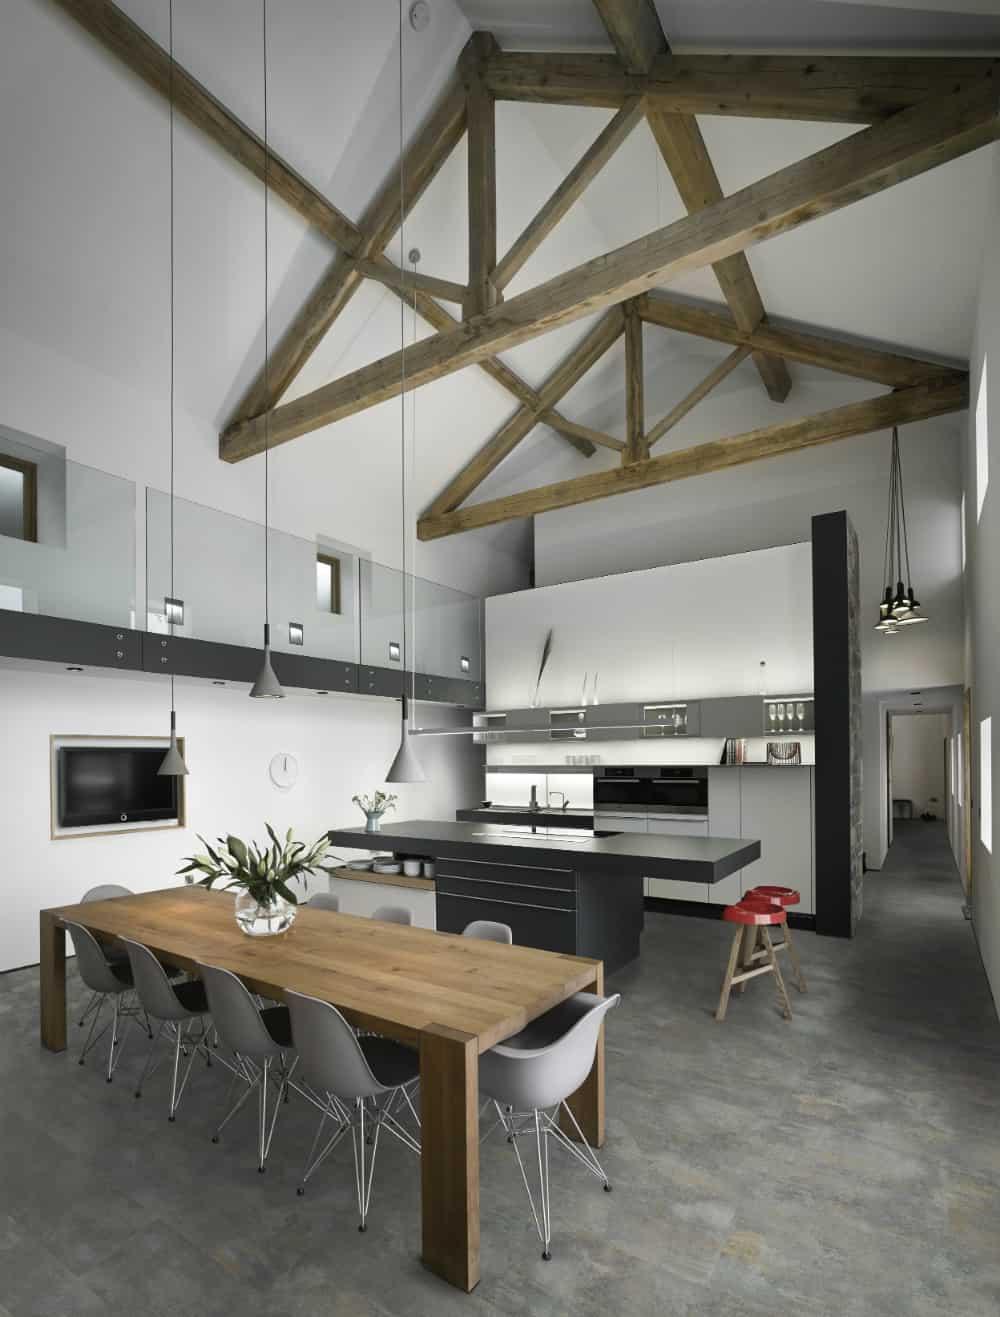 Barn kitchen dining area